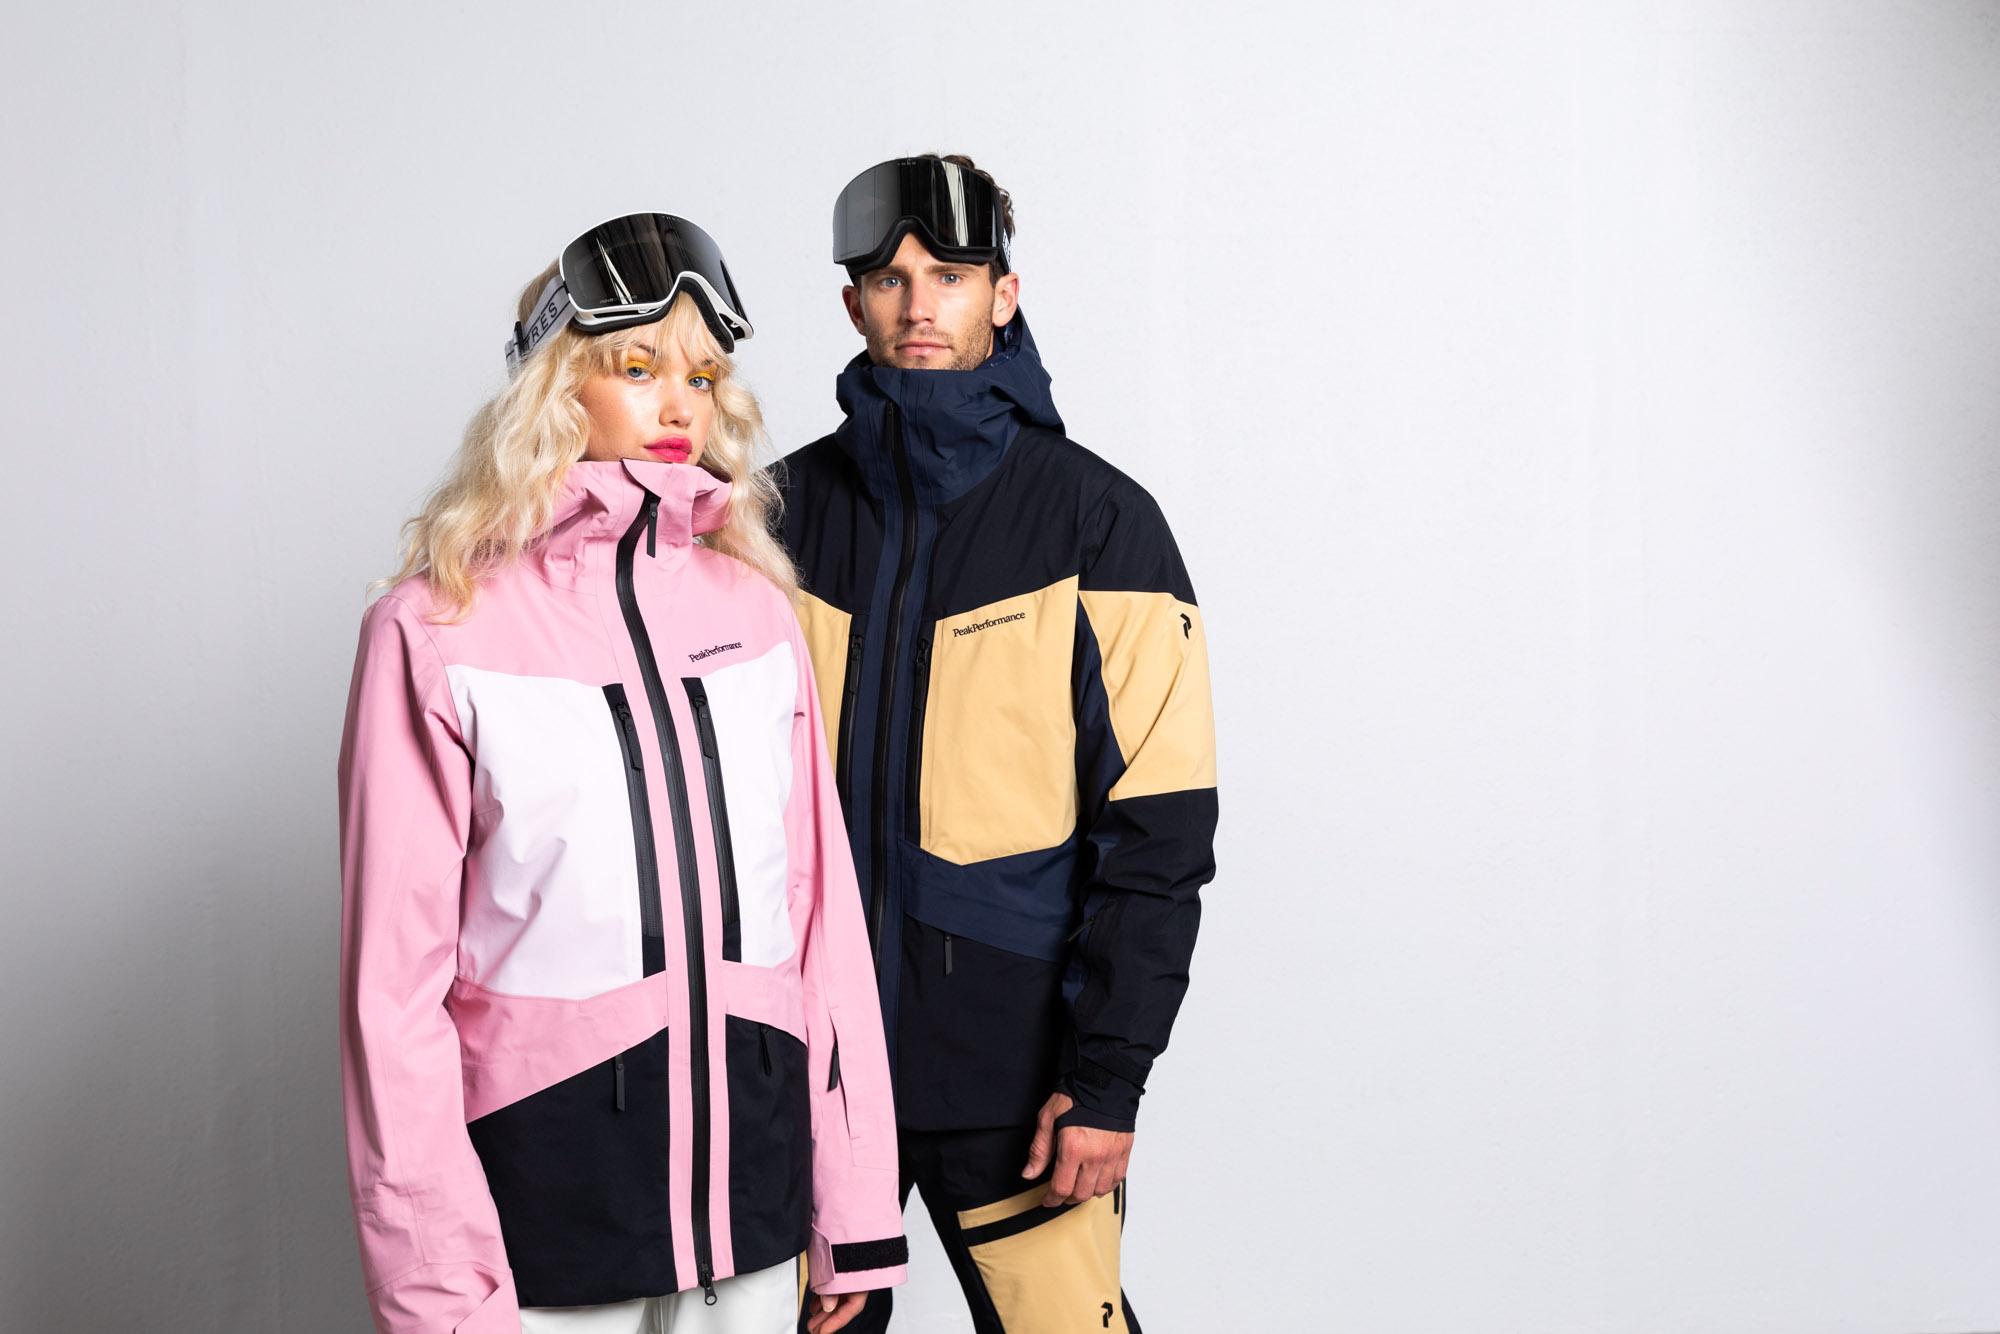 Women's Gravity Ski Jacket sale